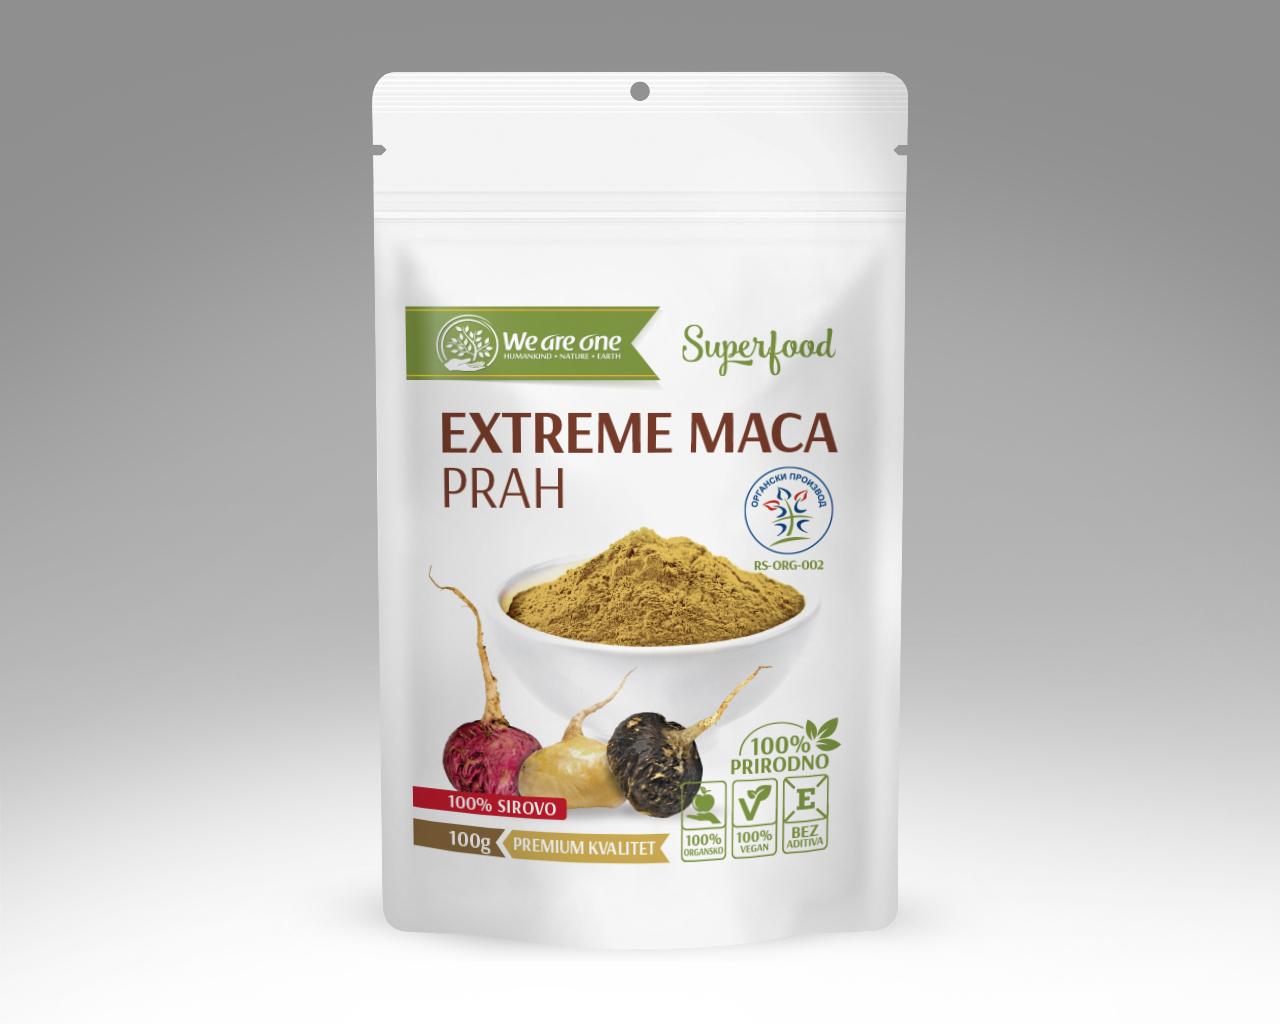 EXTREME MACA (MIX CRNE, ZLATNE, CRVENE MAKE) PRAH, WE ARE ONE 100G